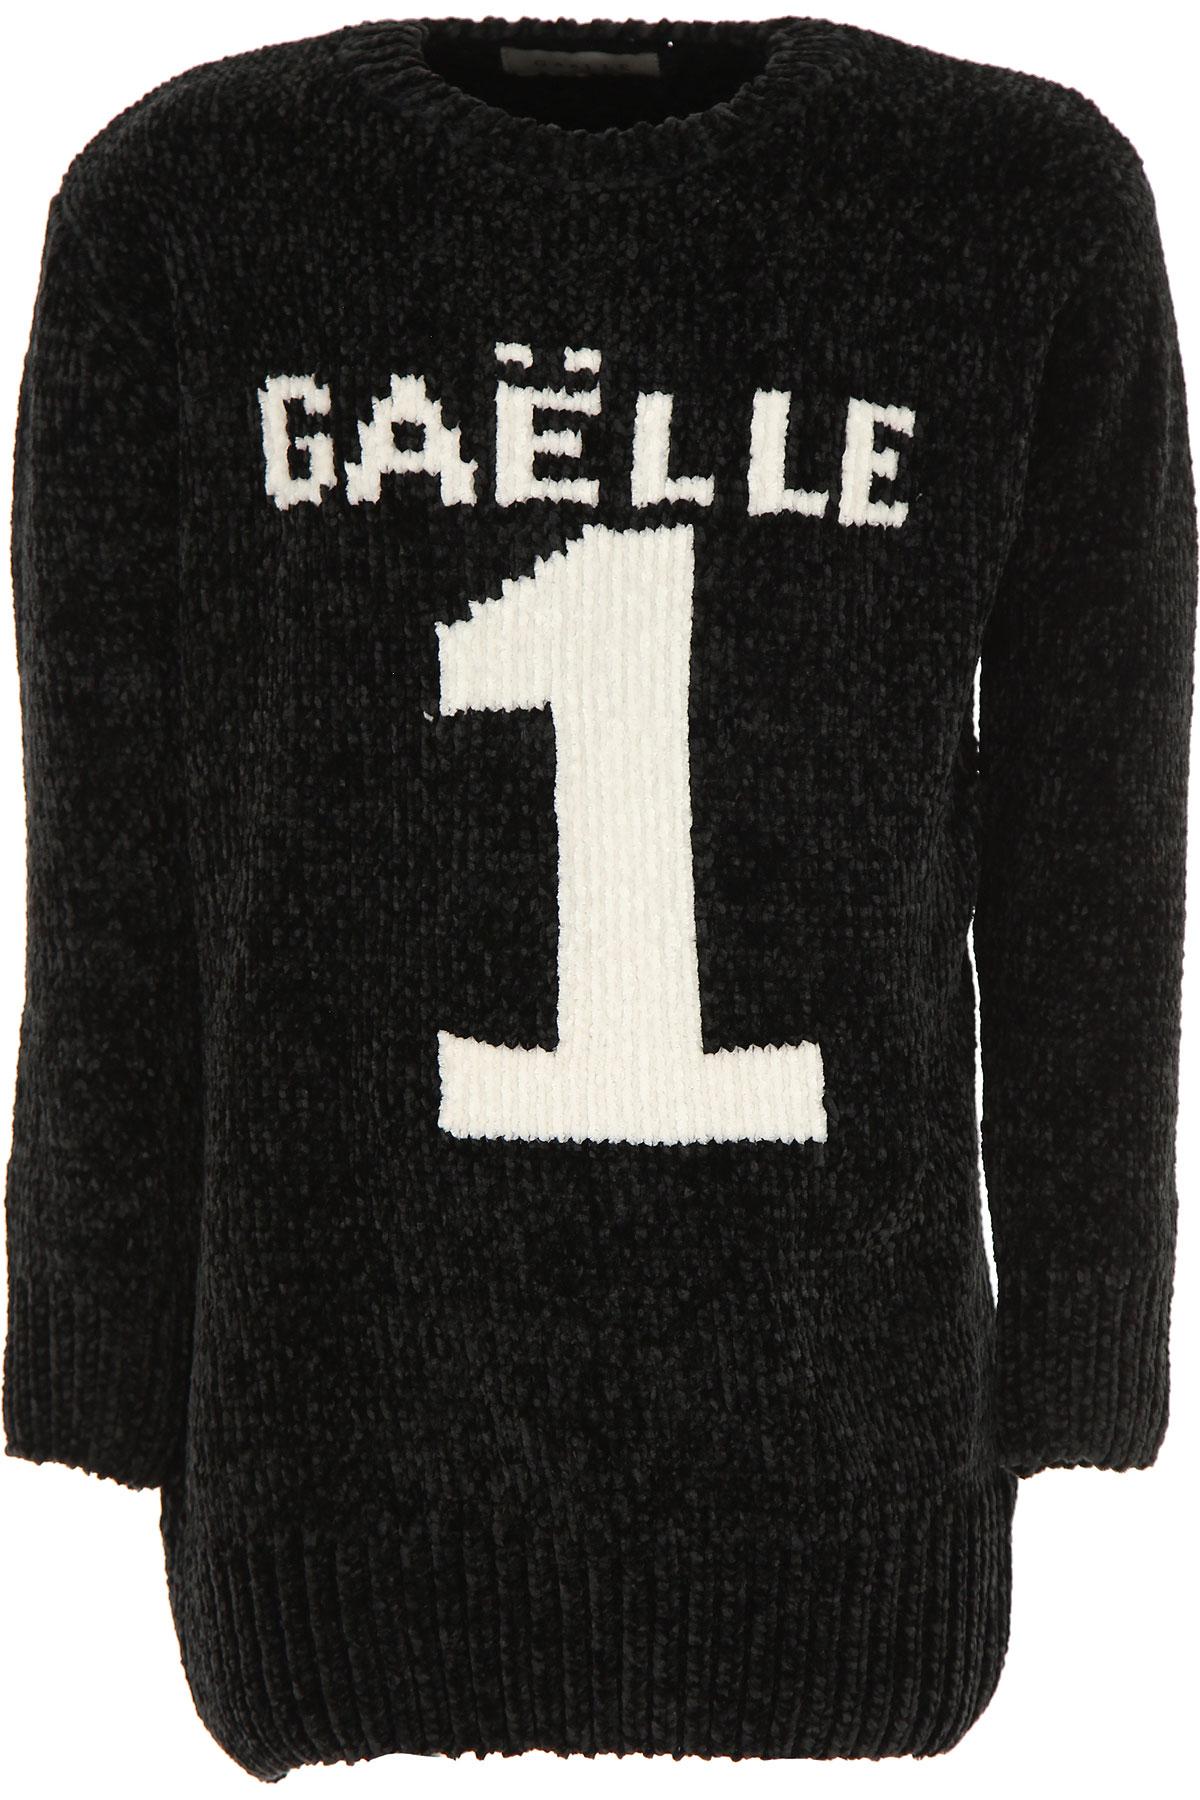 Gaelle Kids Sweaters for Girls On Sale, Black, Viscose, 2019, 10Y 12Y 14Y 16Y 6Y 8Y